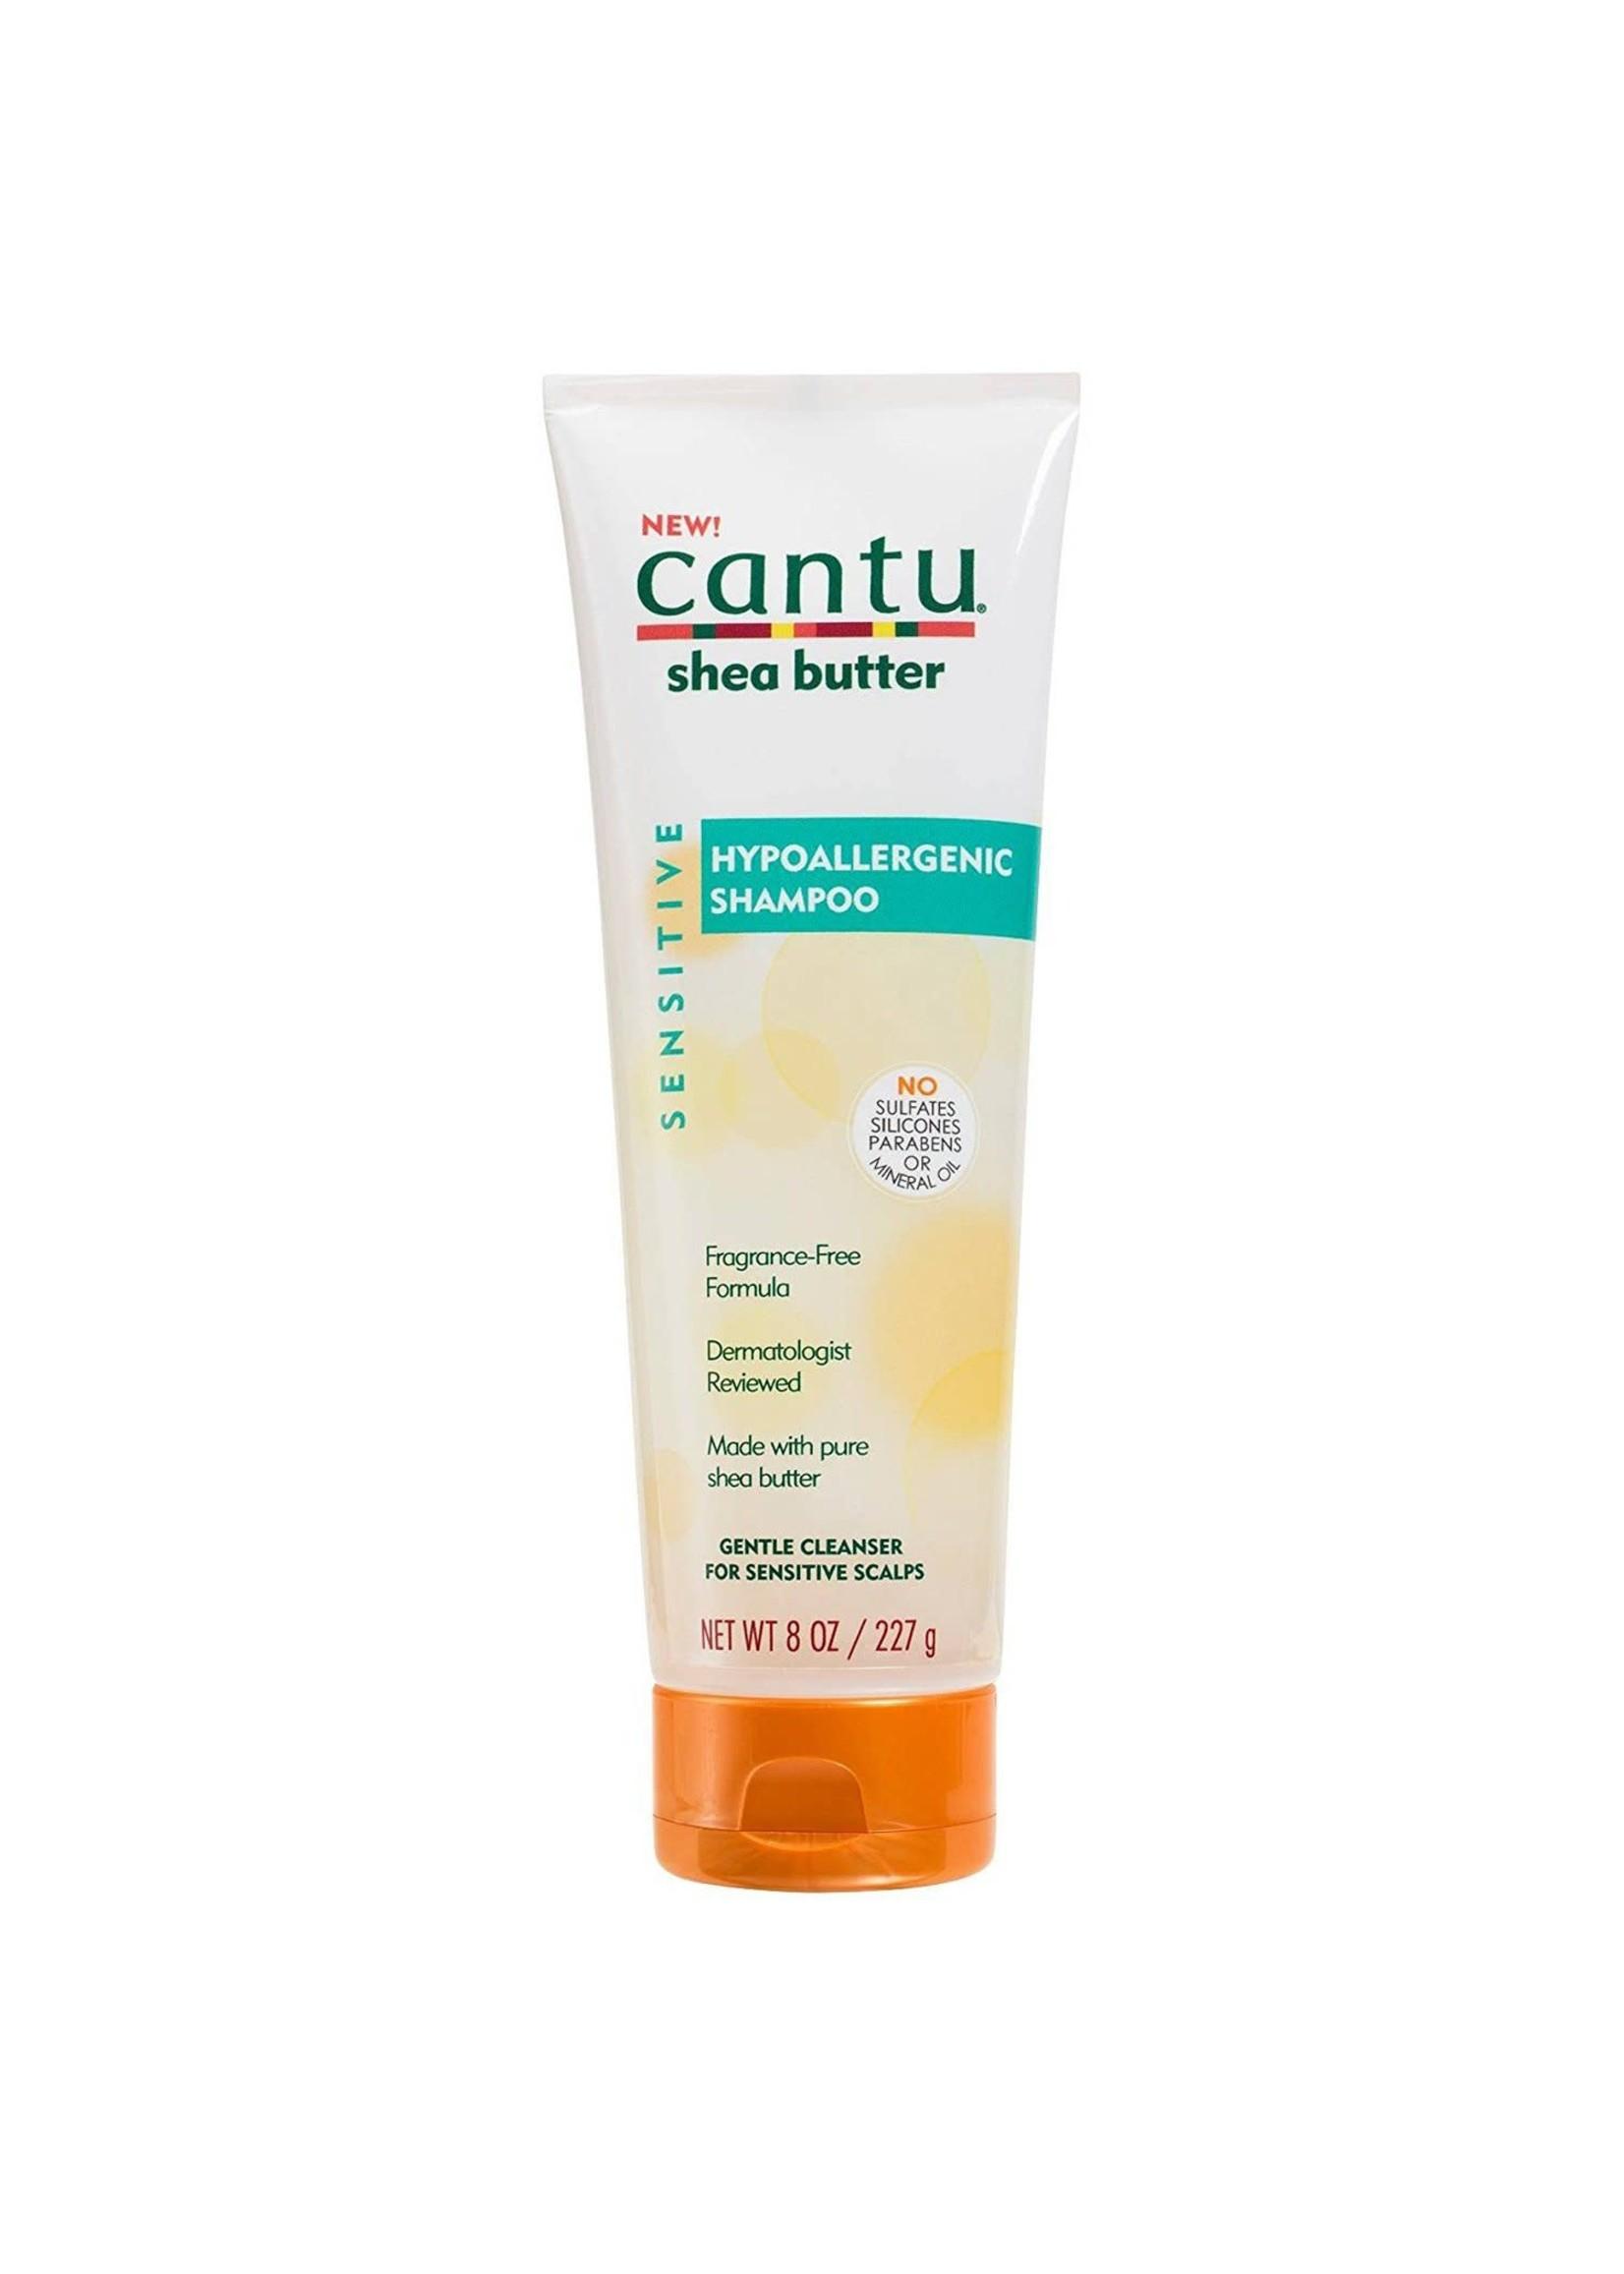 Cantu Shea Butter HypoAllergenic Shampoo